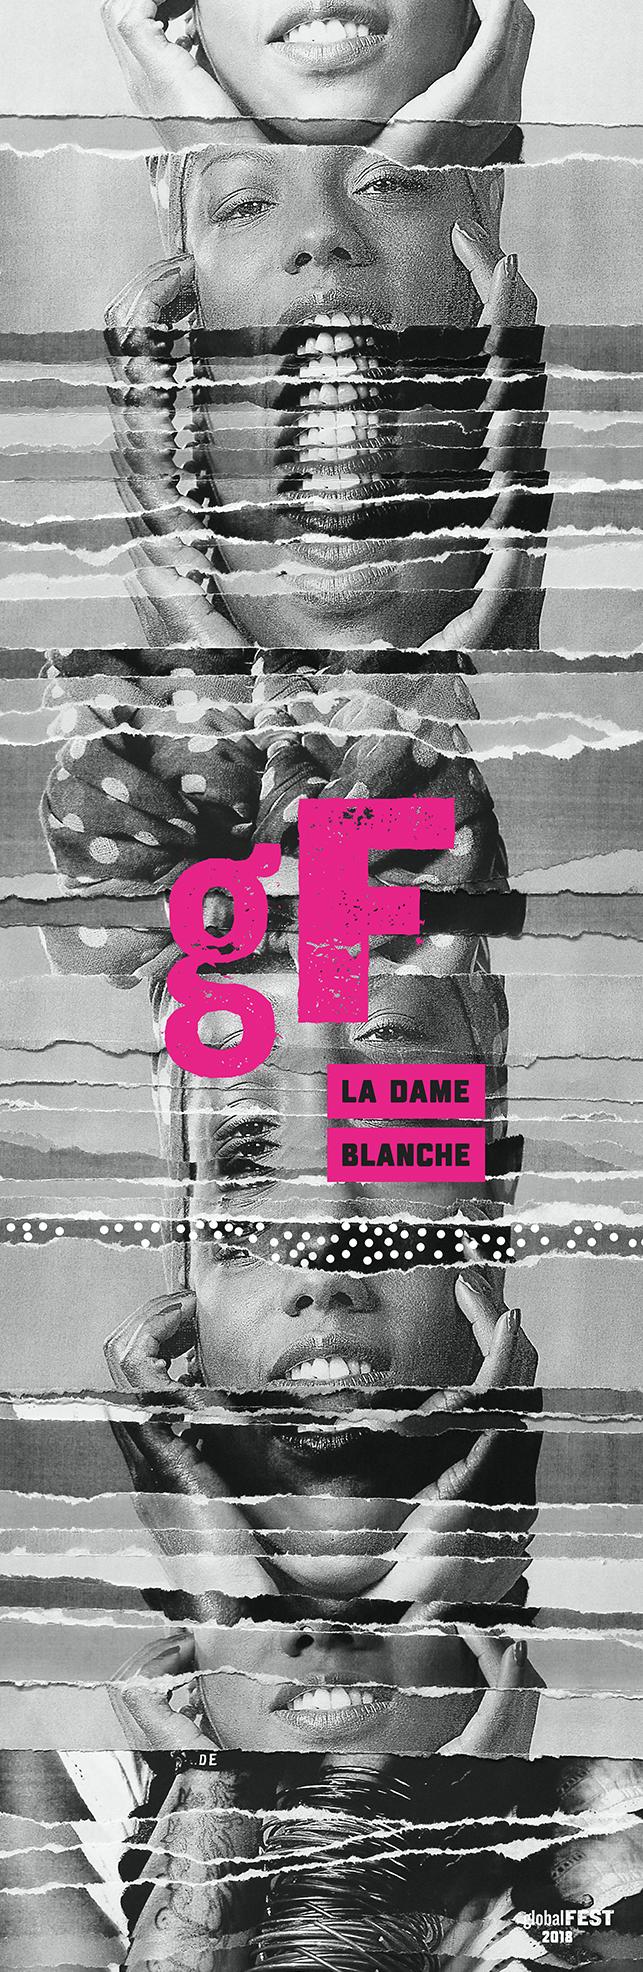 diogomontes_globalfest_artist_posters-ladameblanche